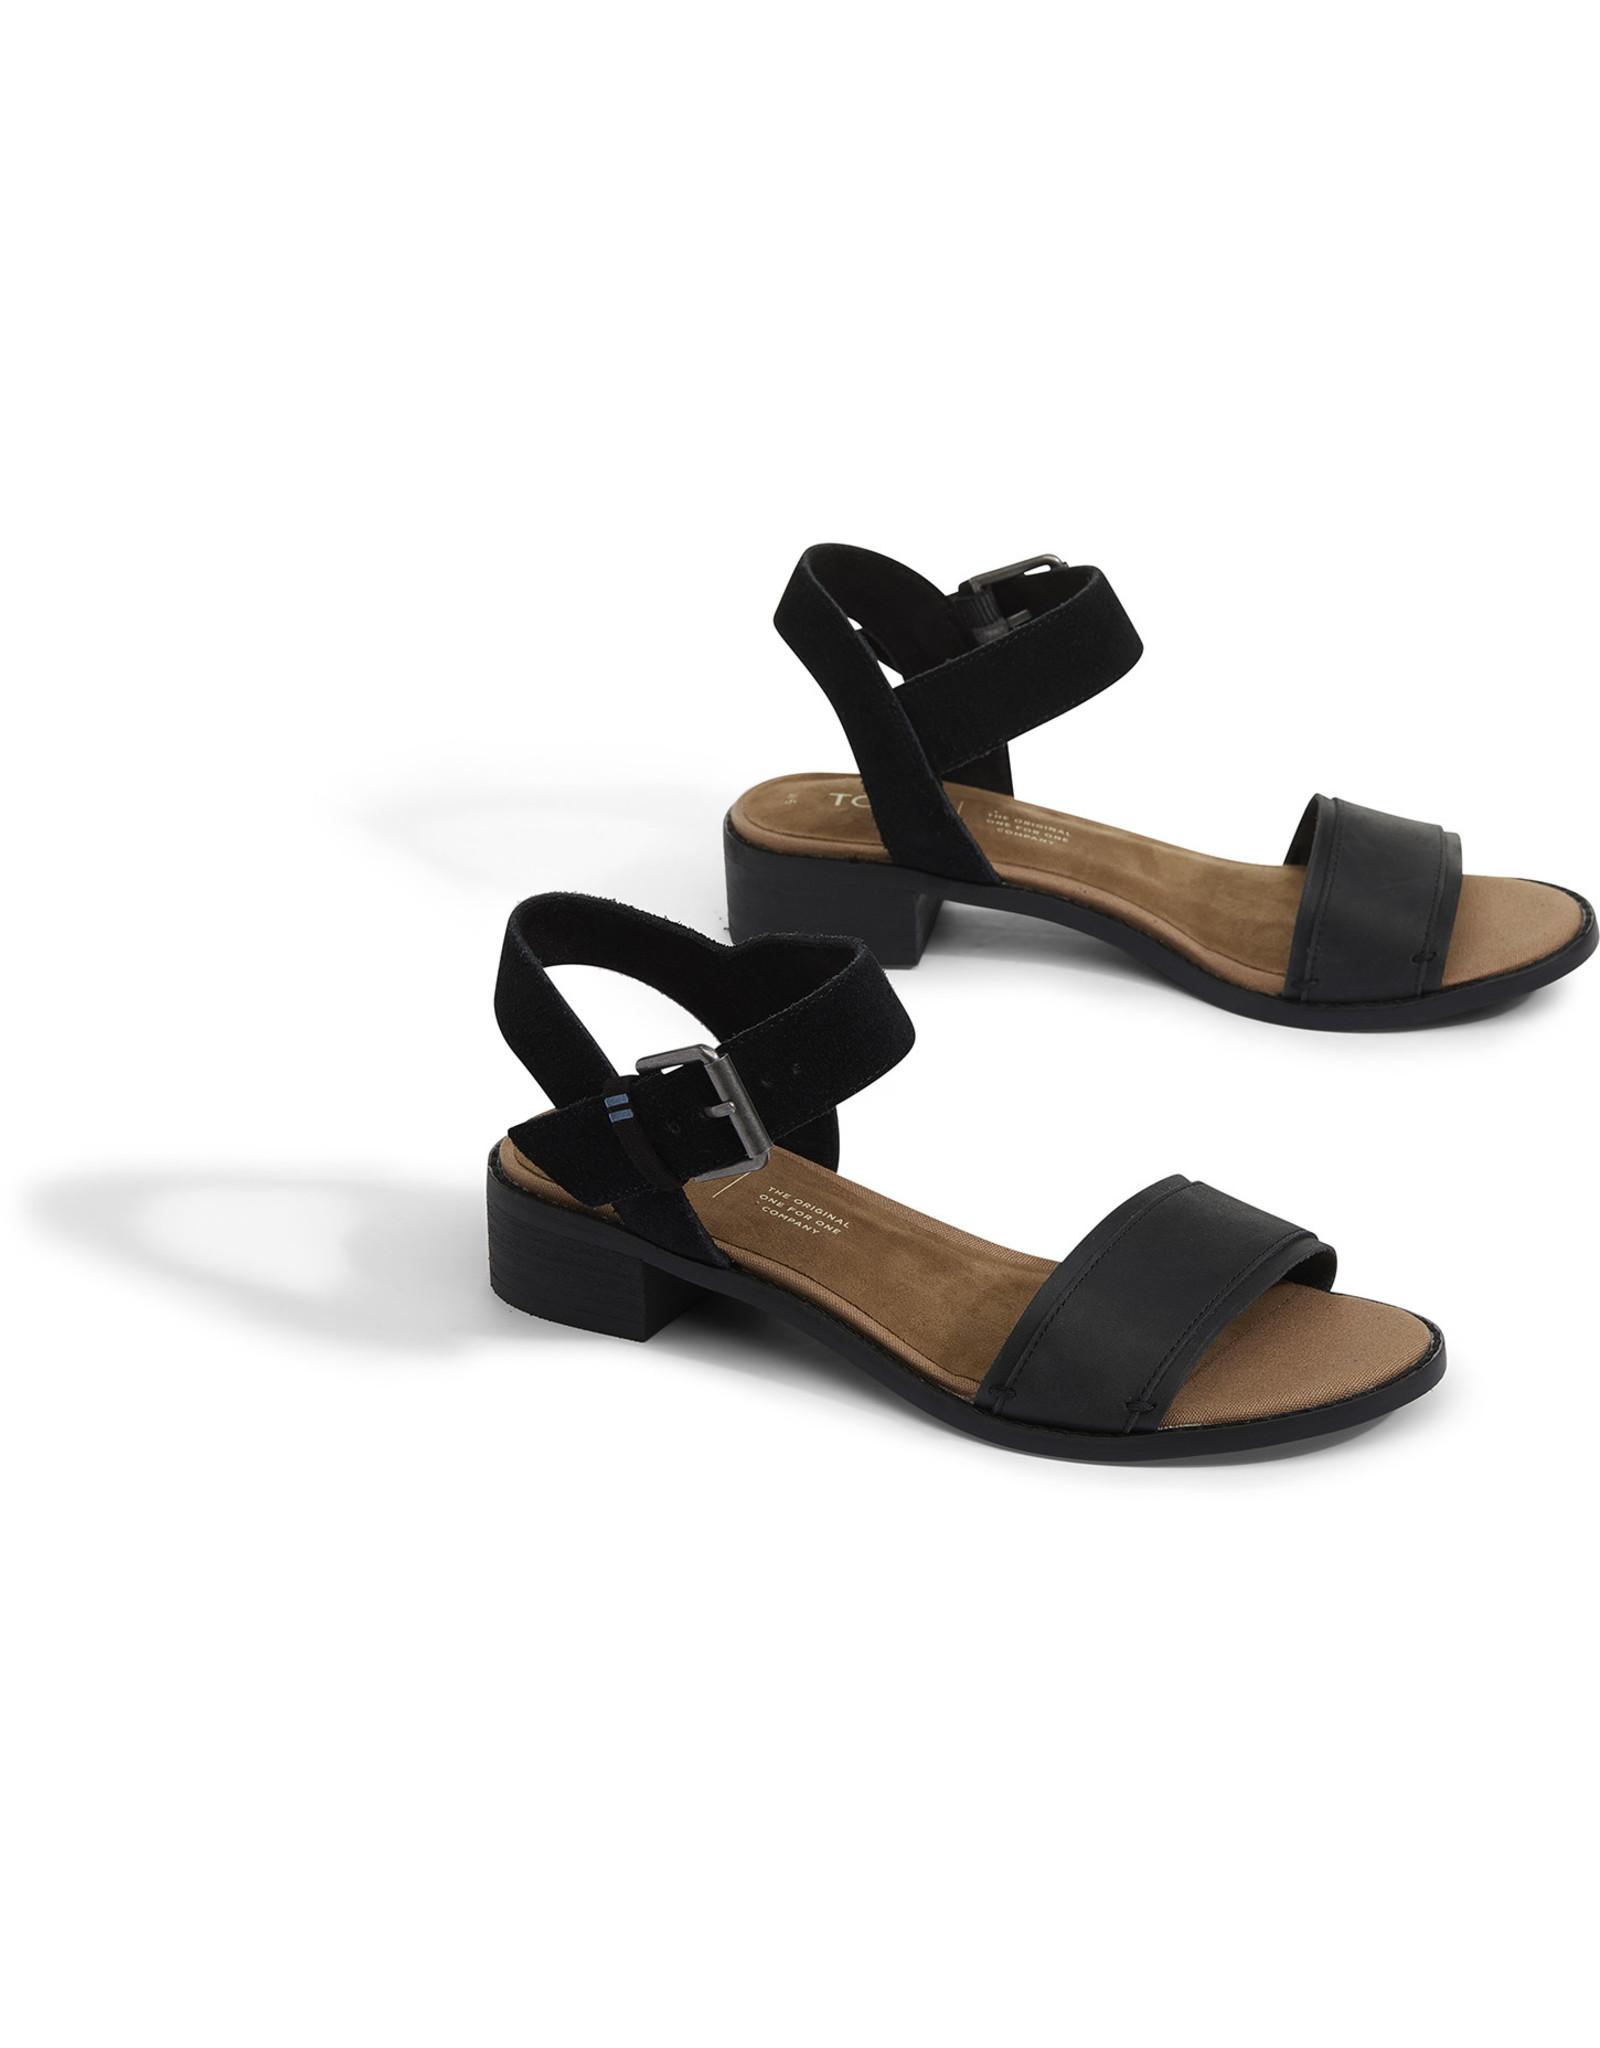 TOMS Women's Camilia Sandals - SP19